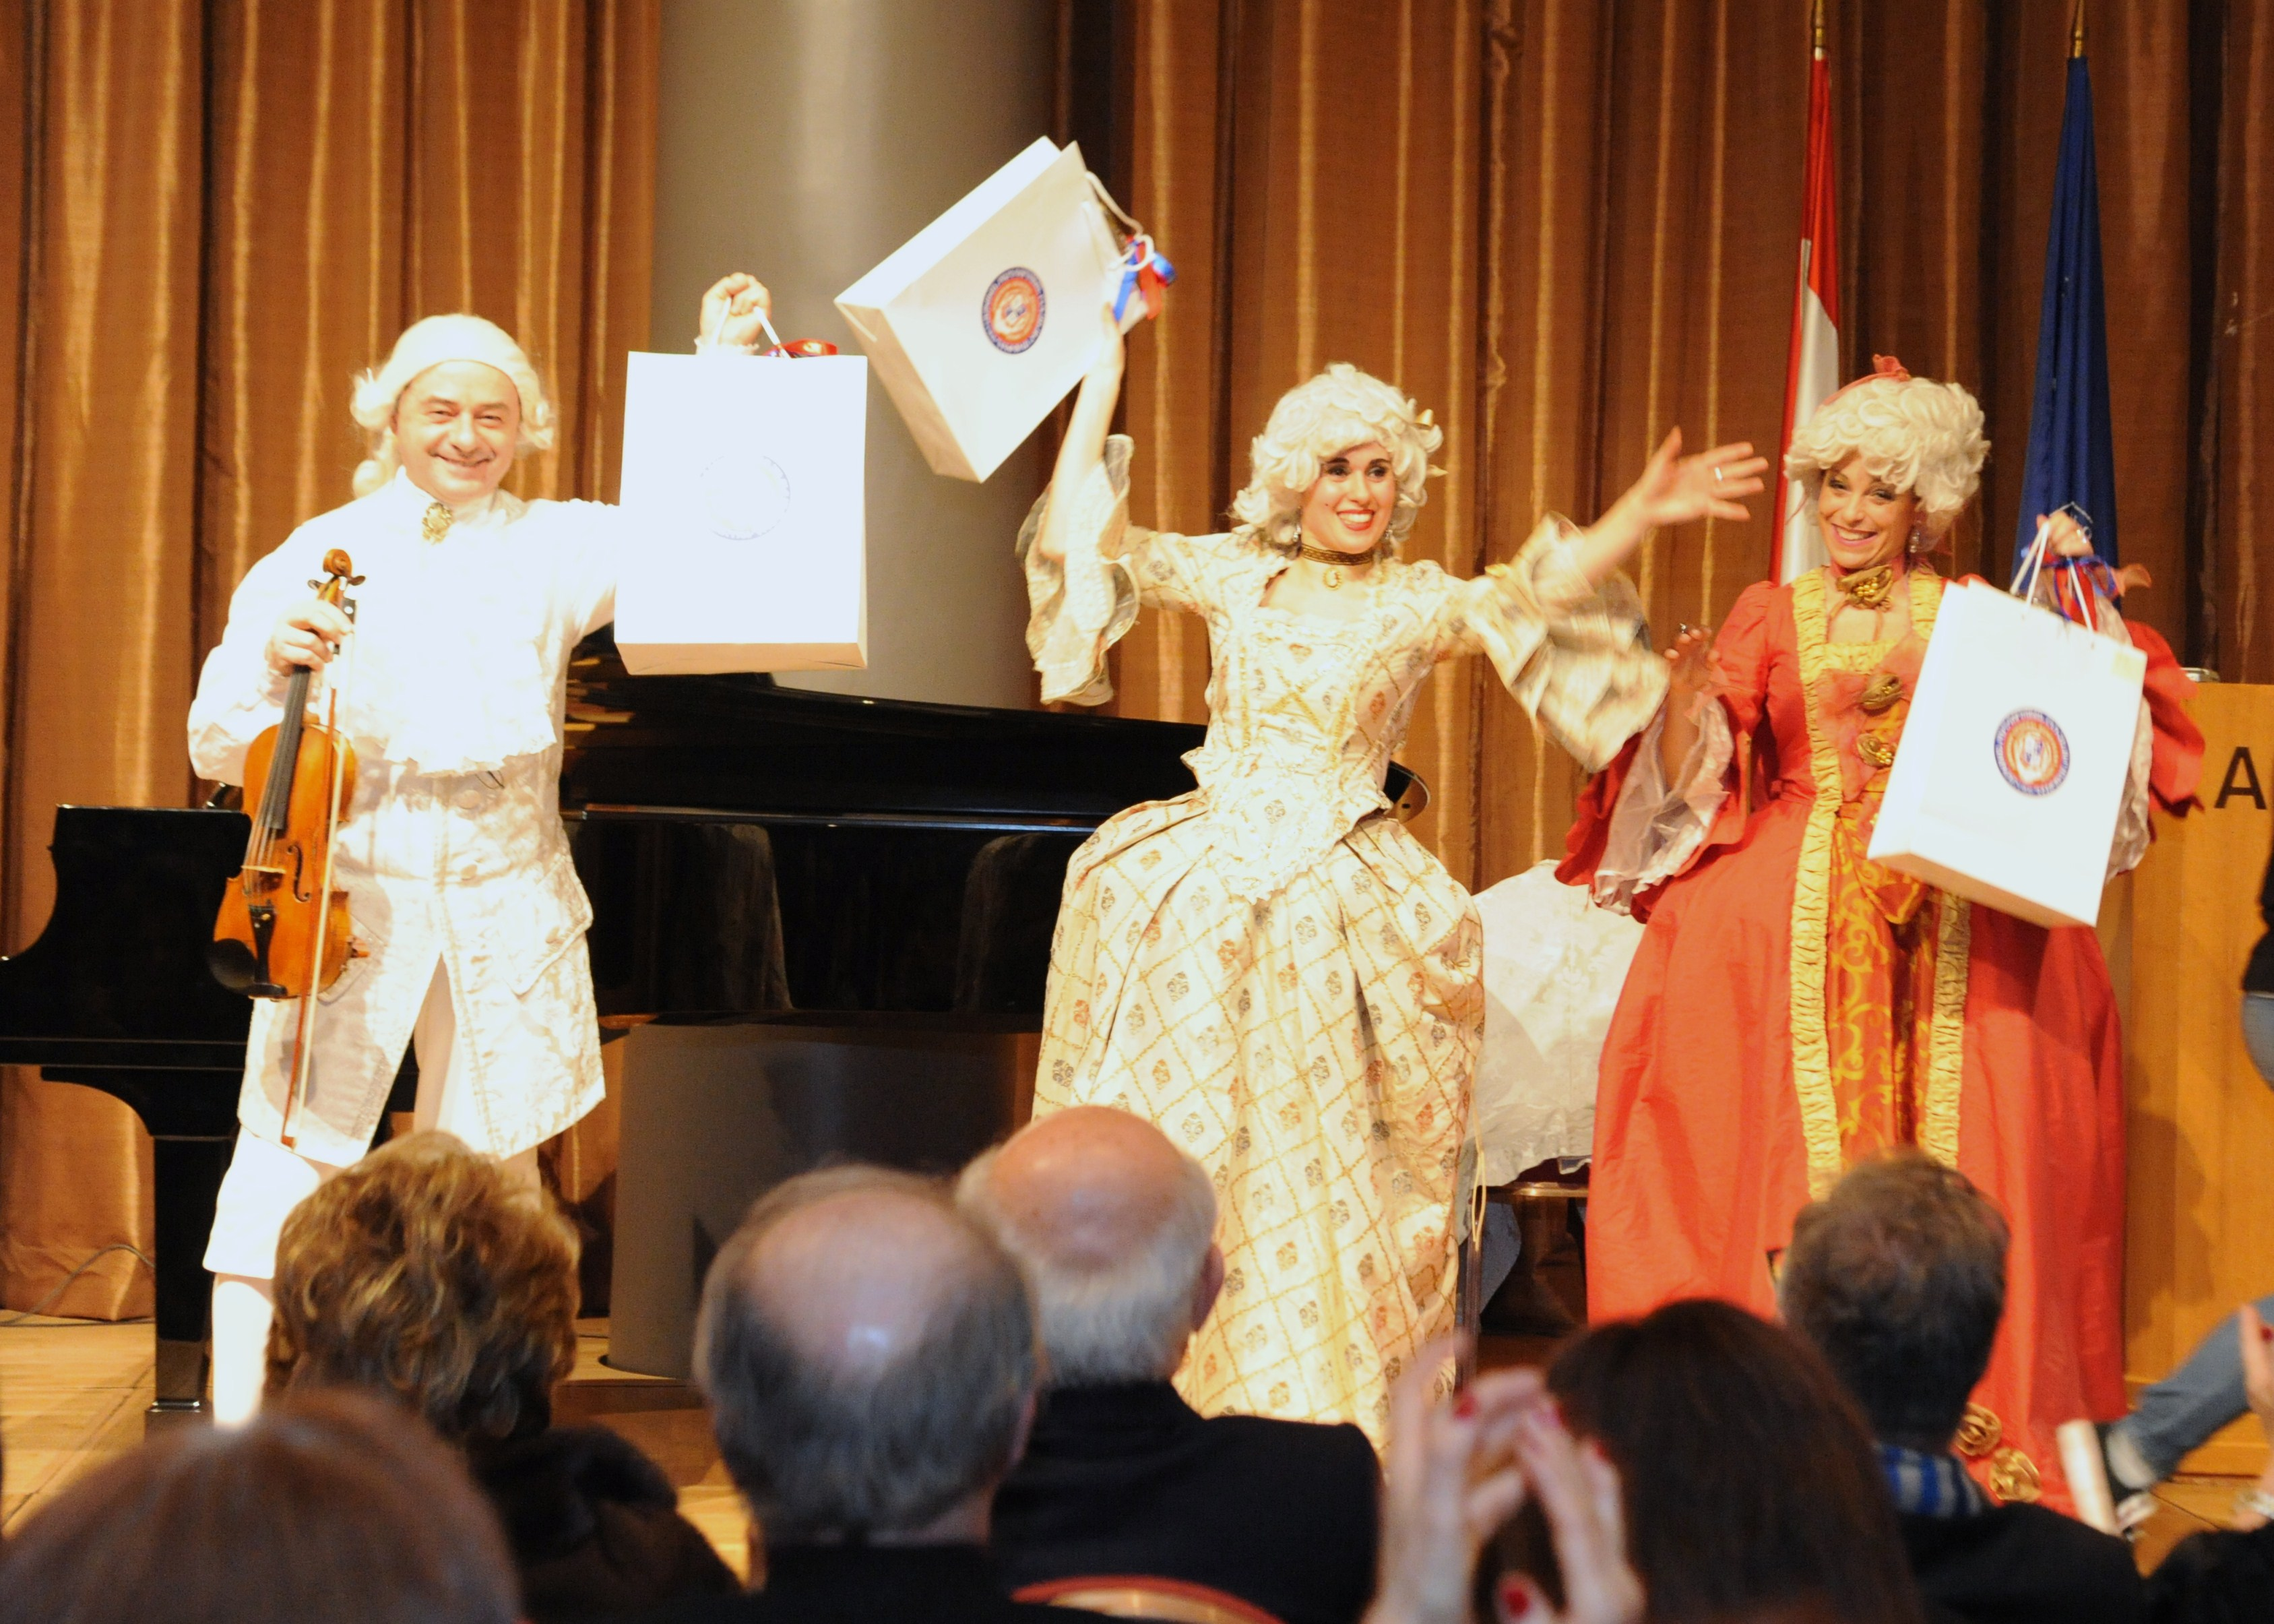 AGBU Lebanon and the Italian Cultural Institute; The Baroque Ensemble